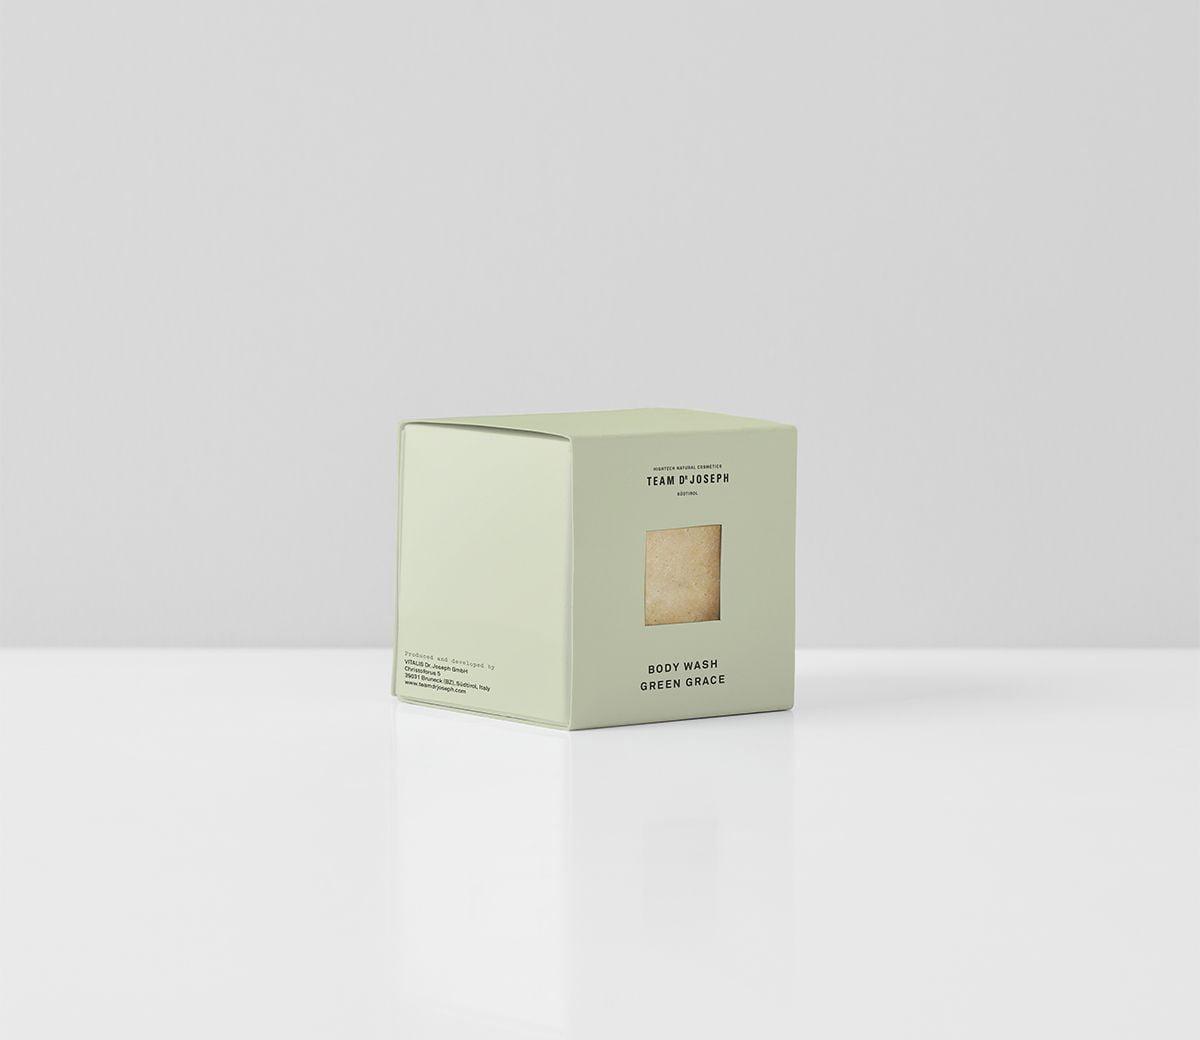 Zero Waste - Green Grace Body Wash, 60g